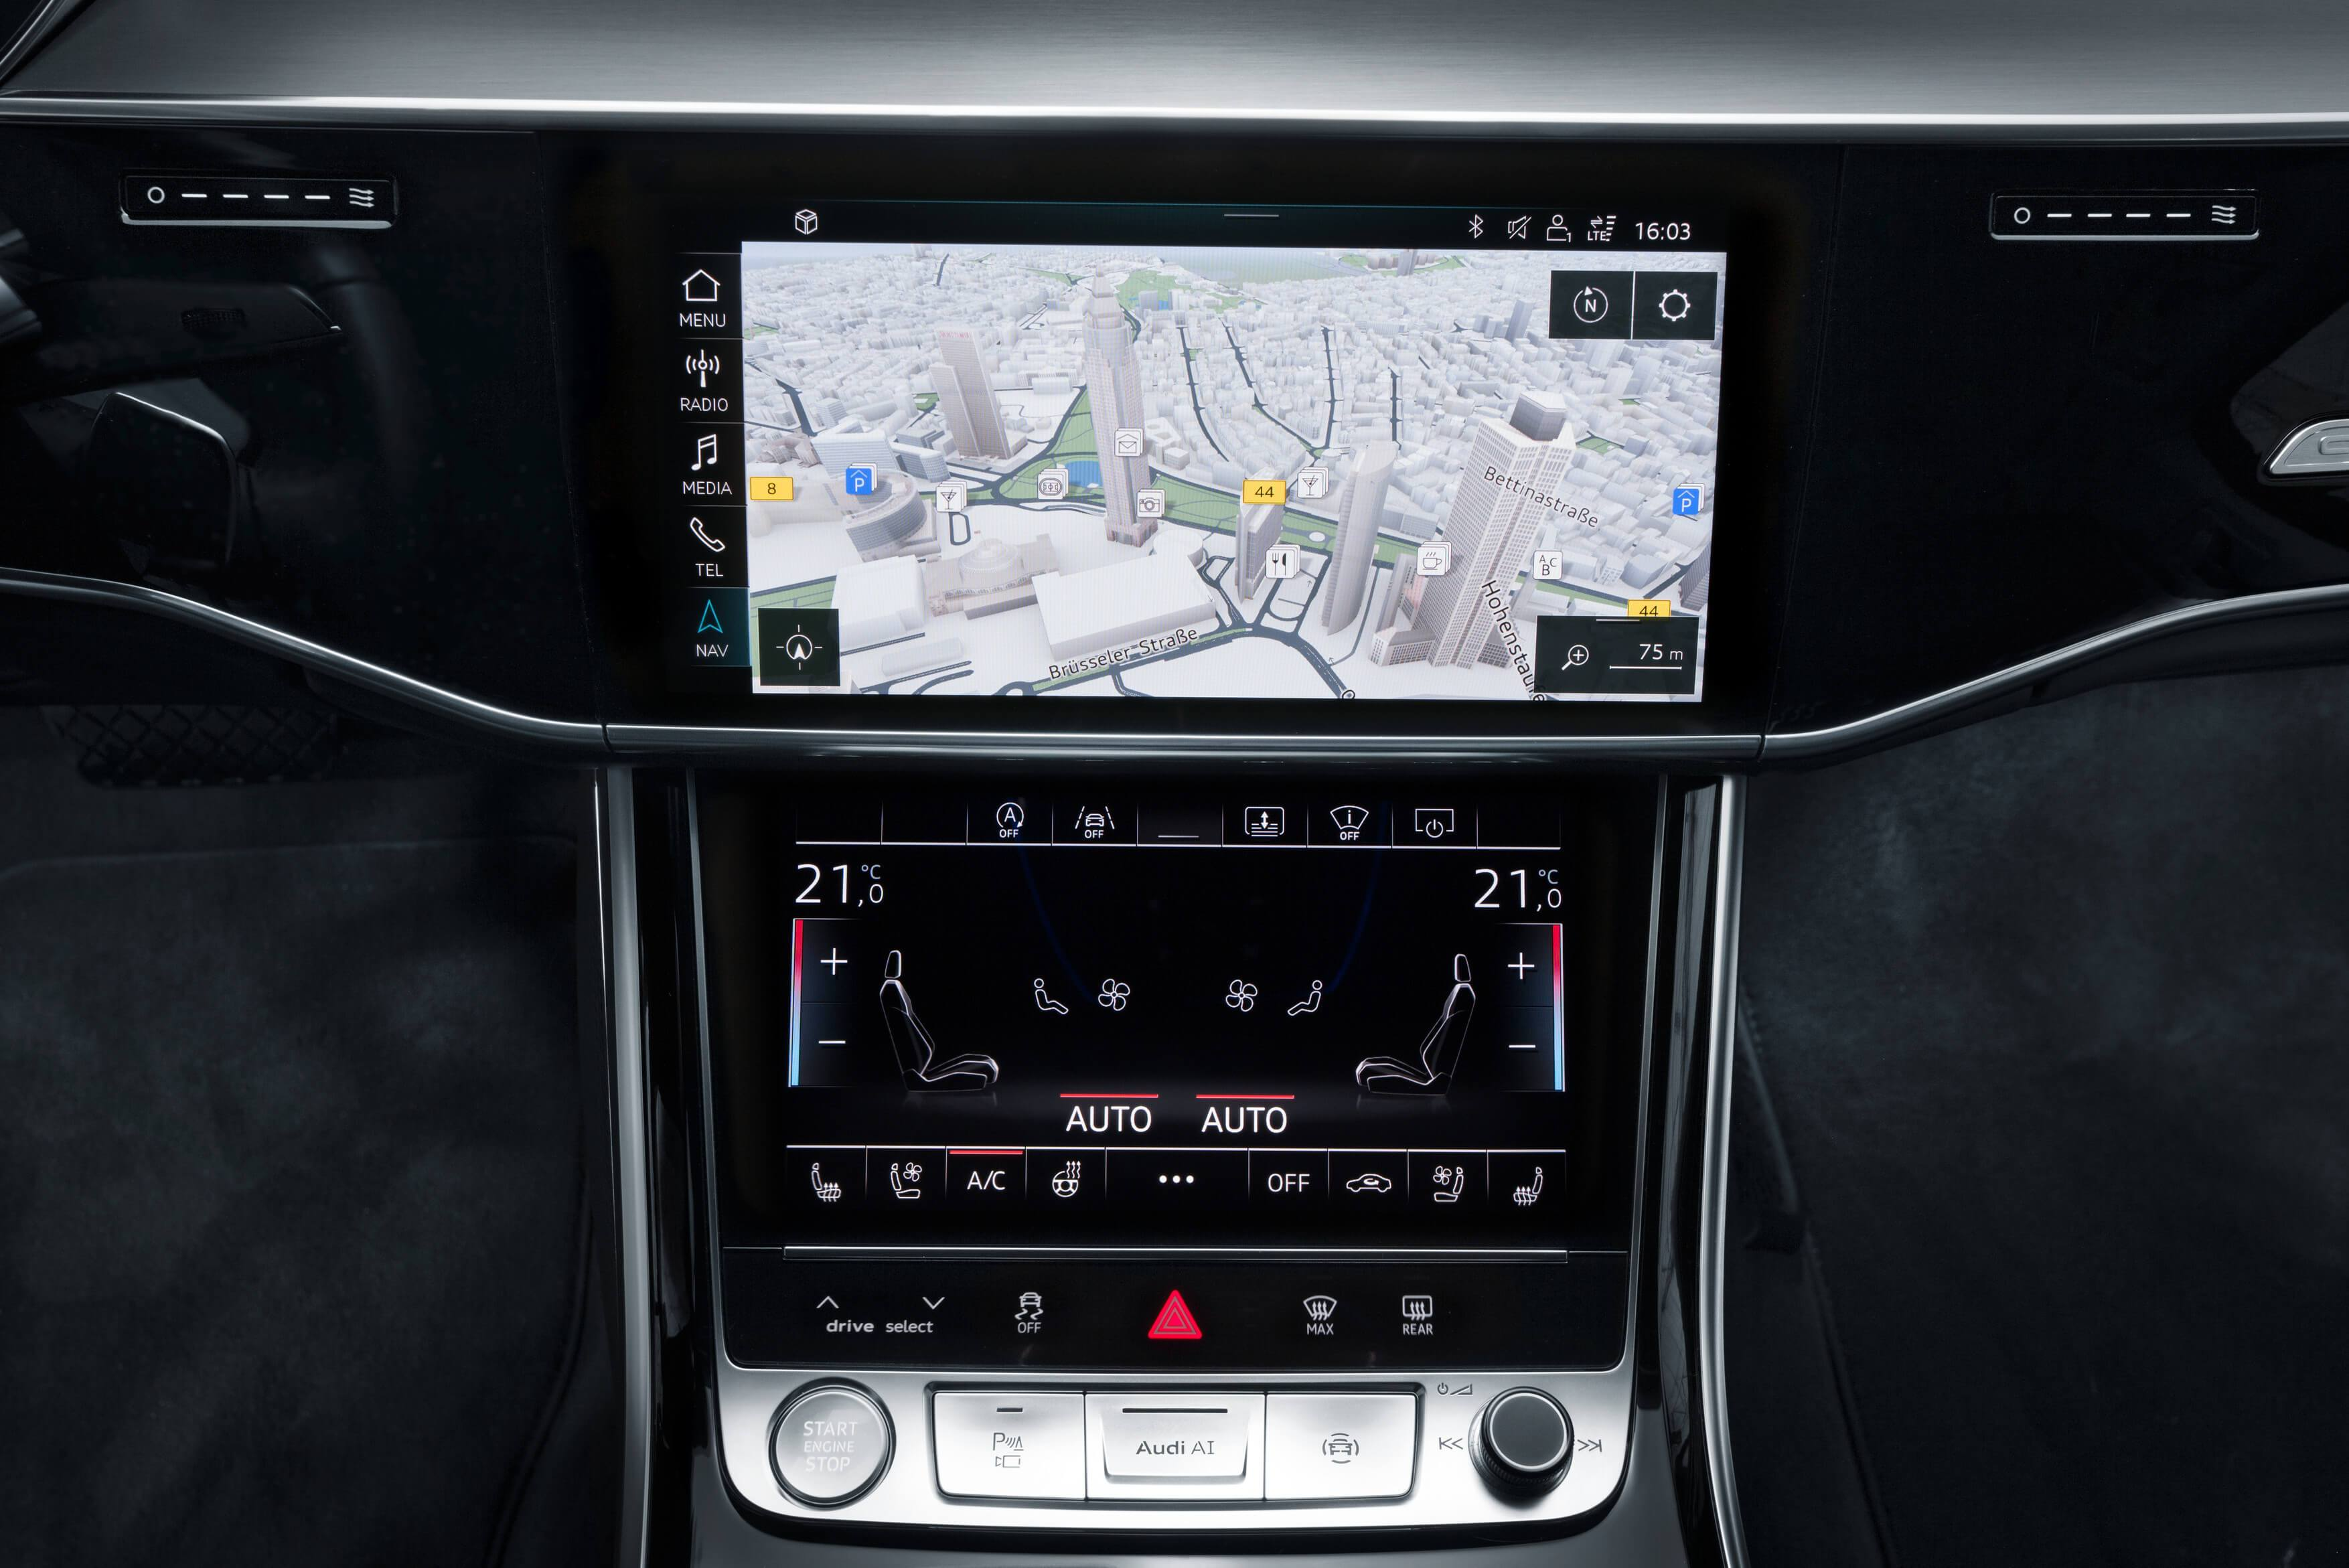 Audi и HERE - навигационные технологии